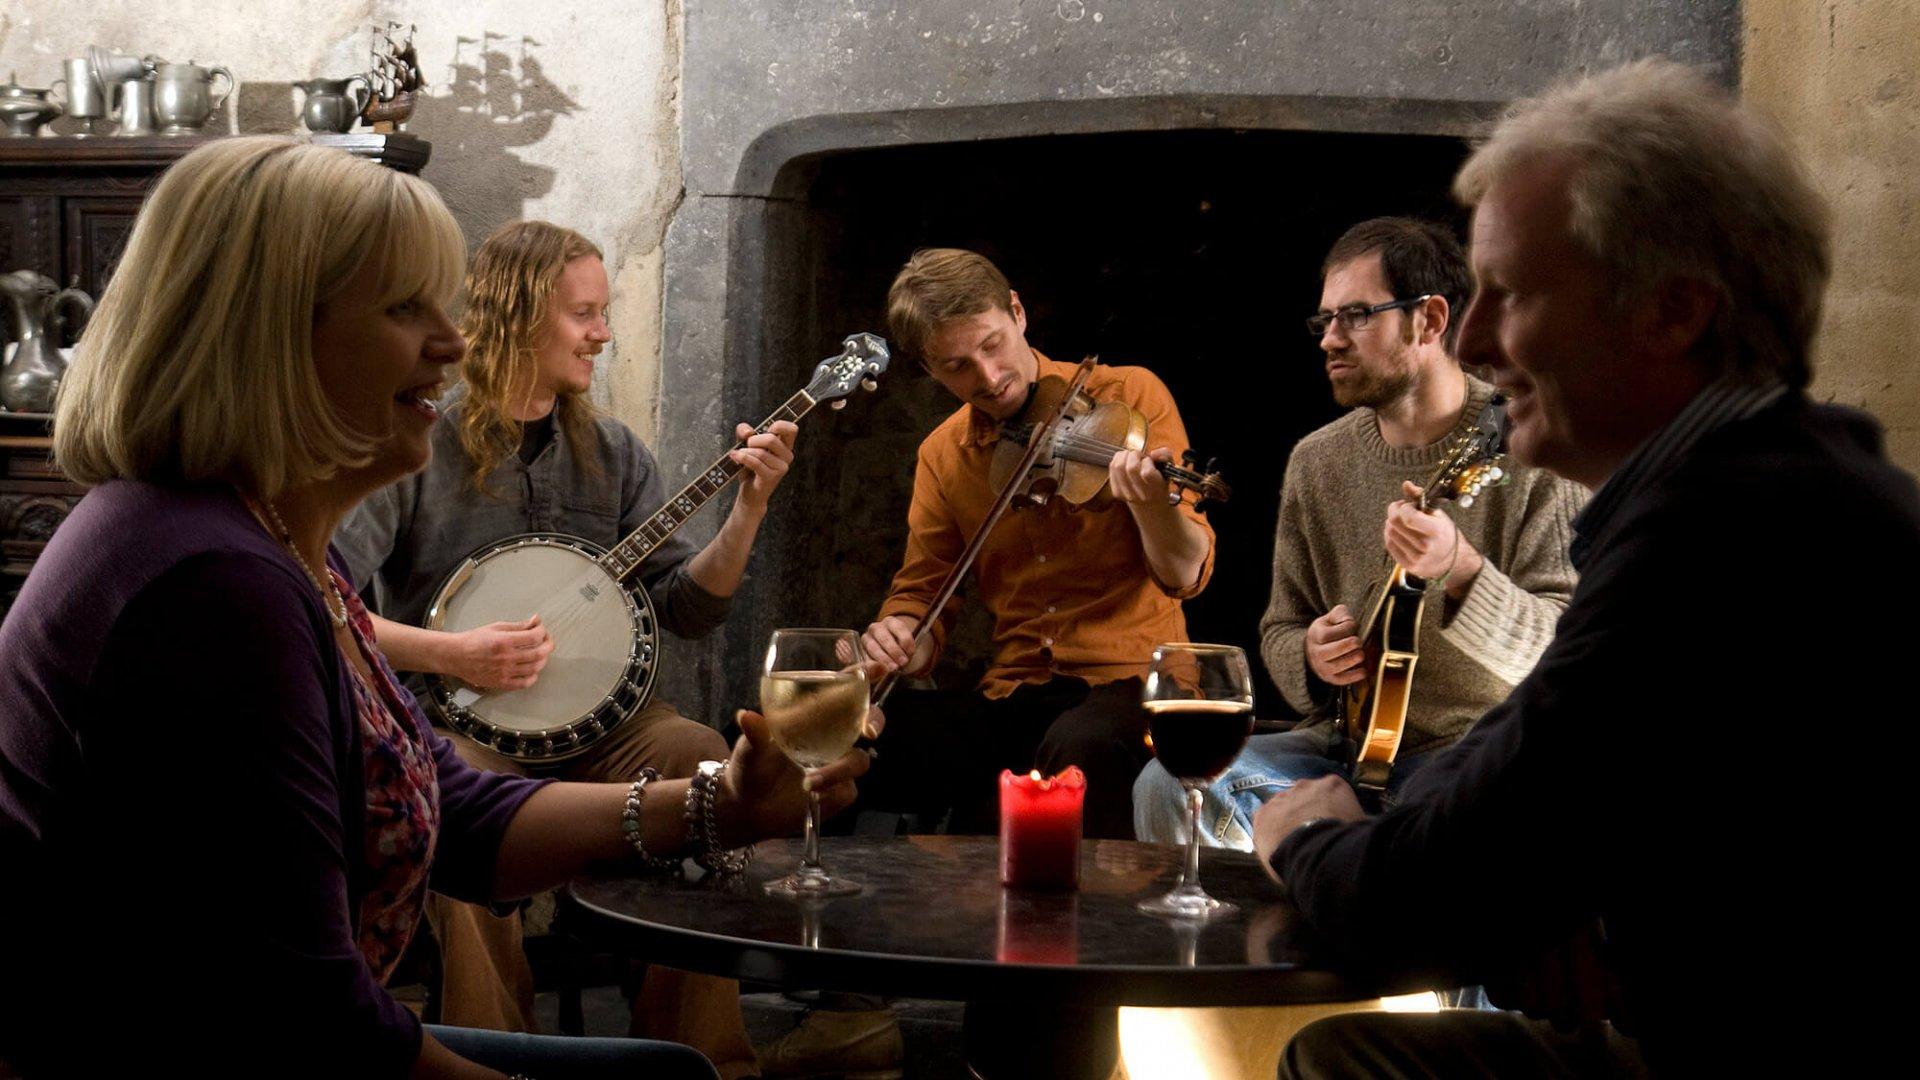 A couple enjoy three Irish traditional musicians in a bar